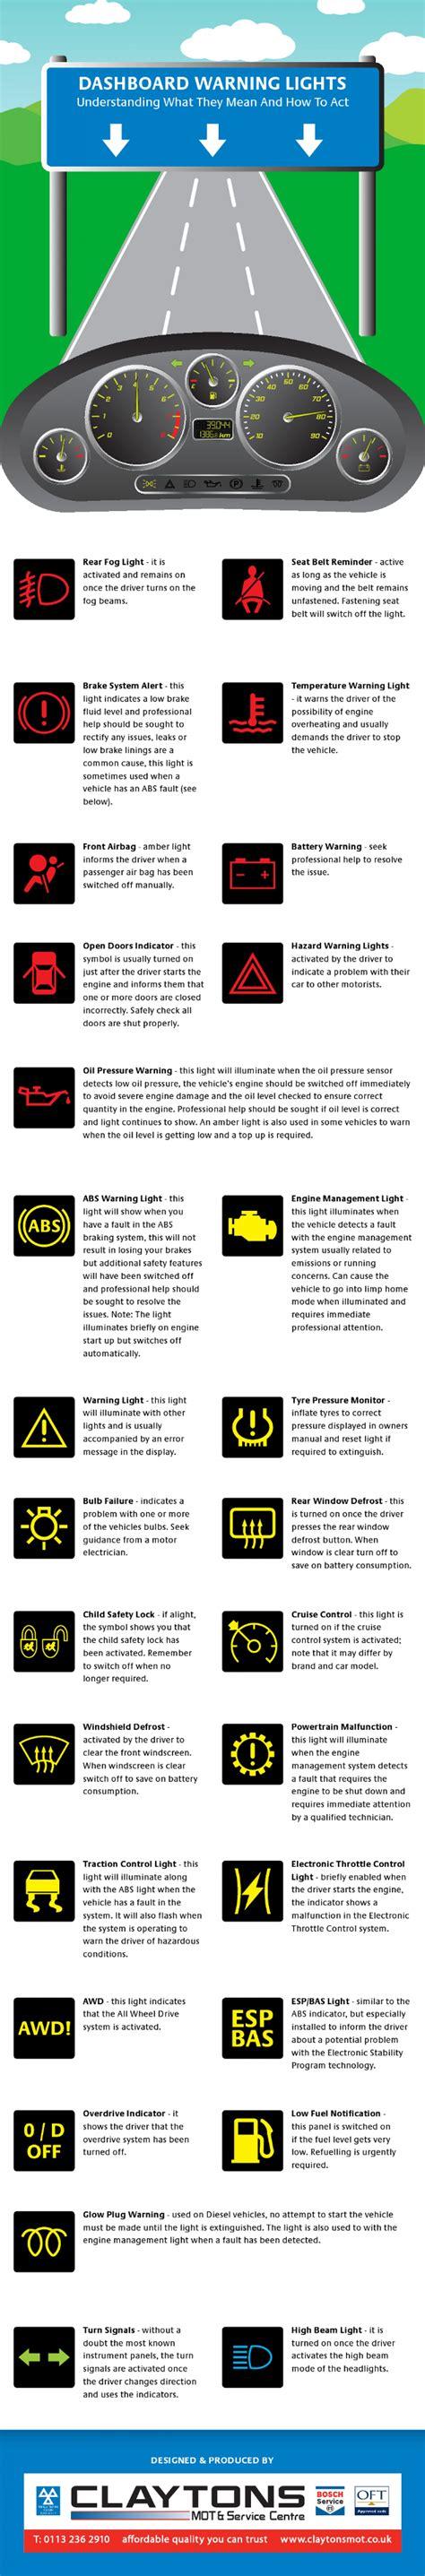 dashboard warning lights meanings decoratingspecialcom